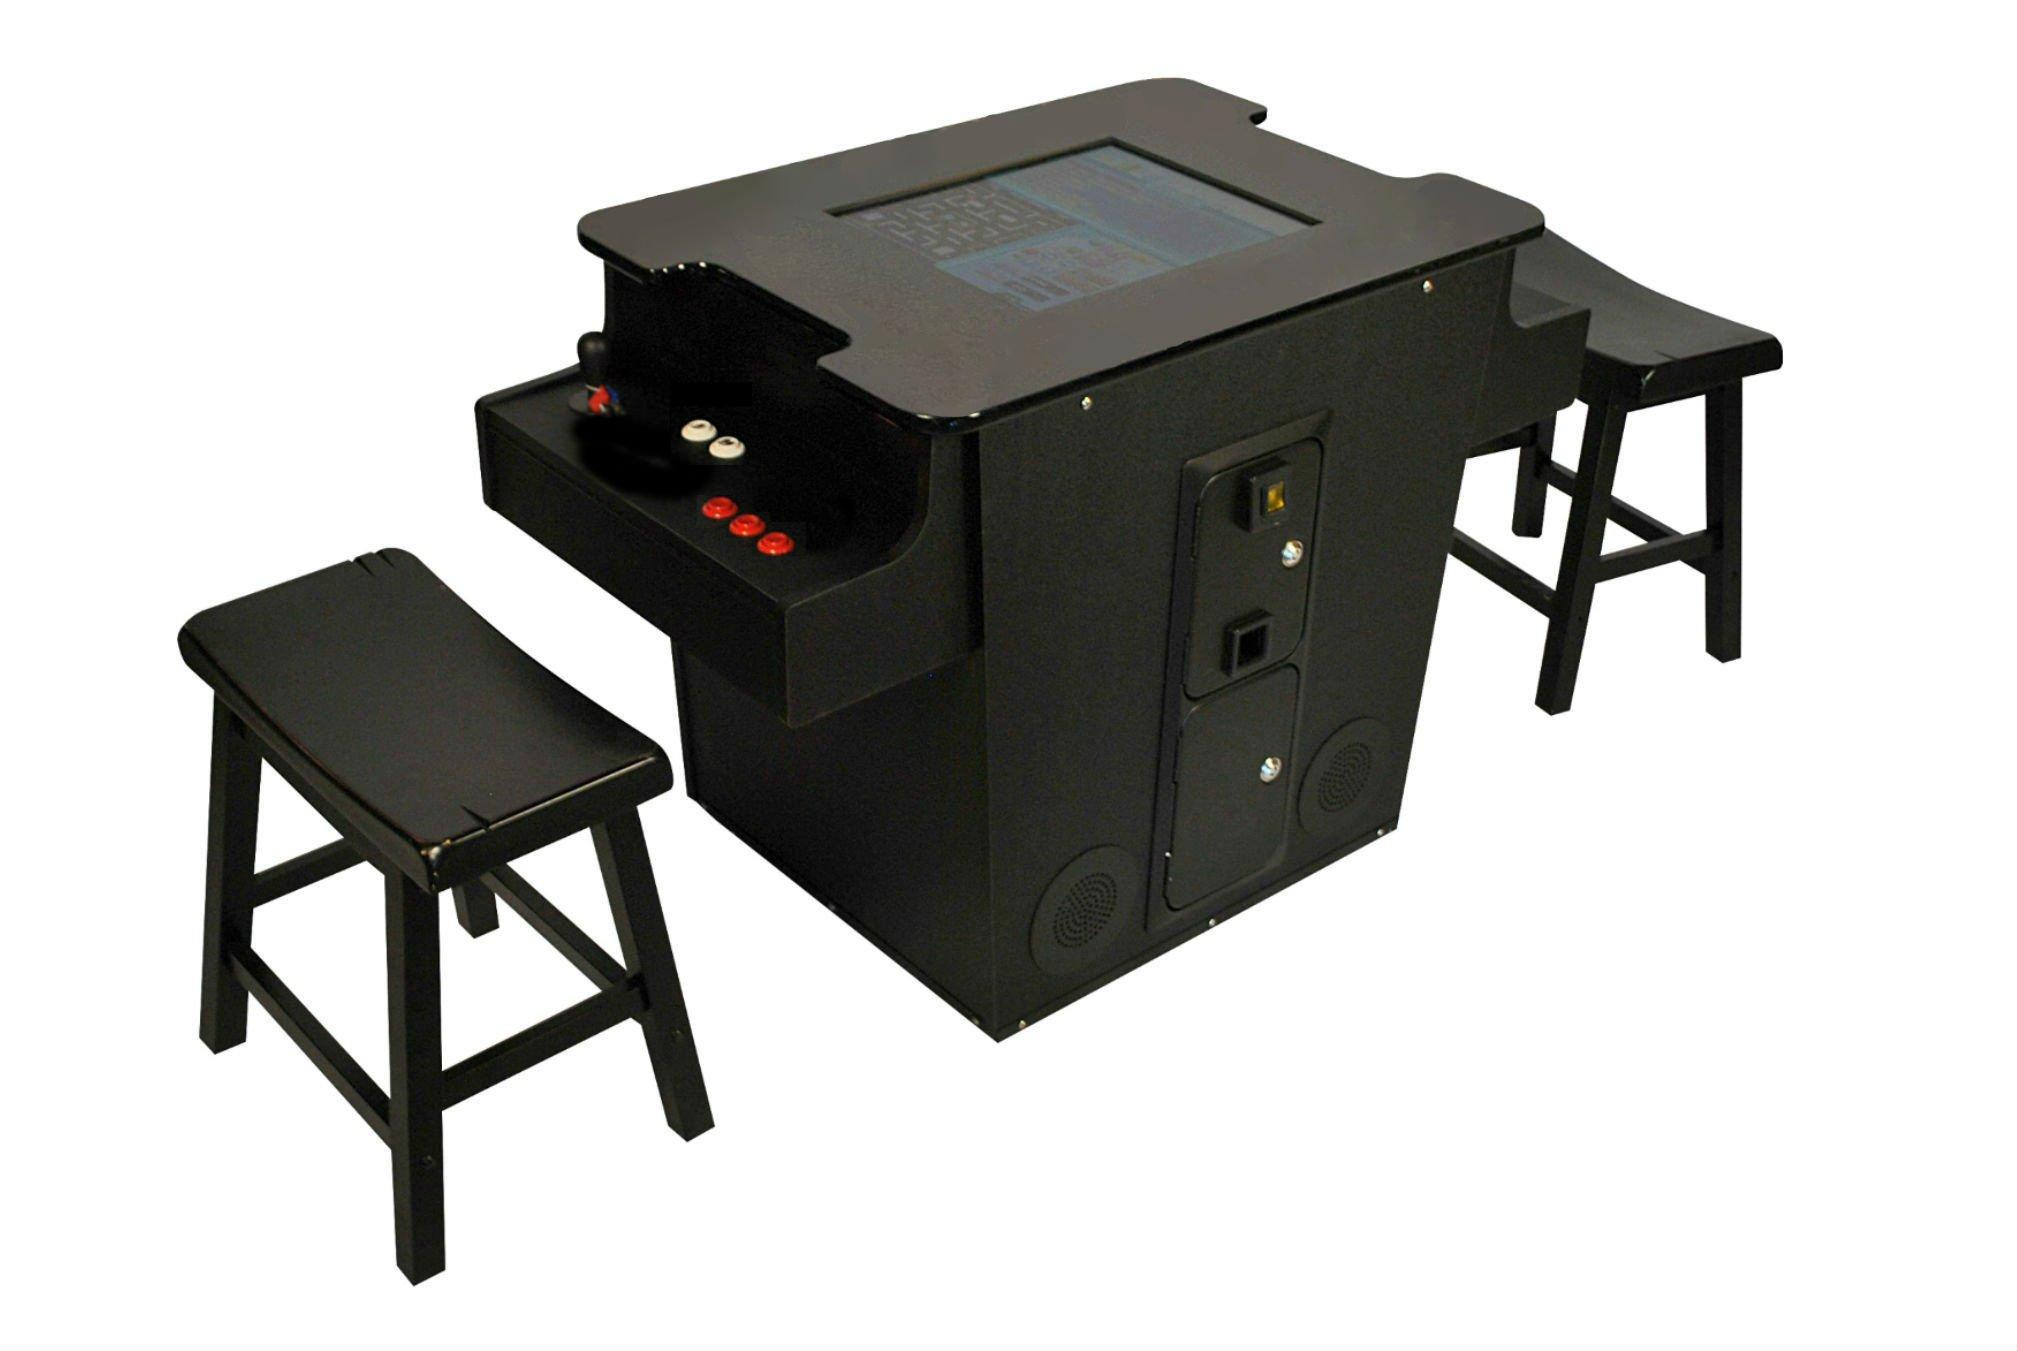 Cocktail Arcade Cabinet Kit Amazoncom Cocktail Arcade Machine 60 Games Includes 2 Stools